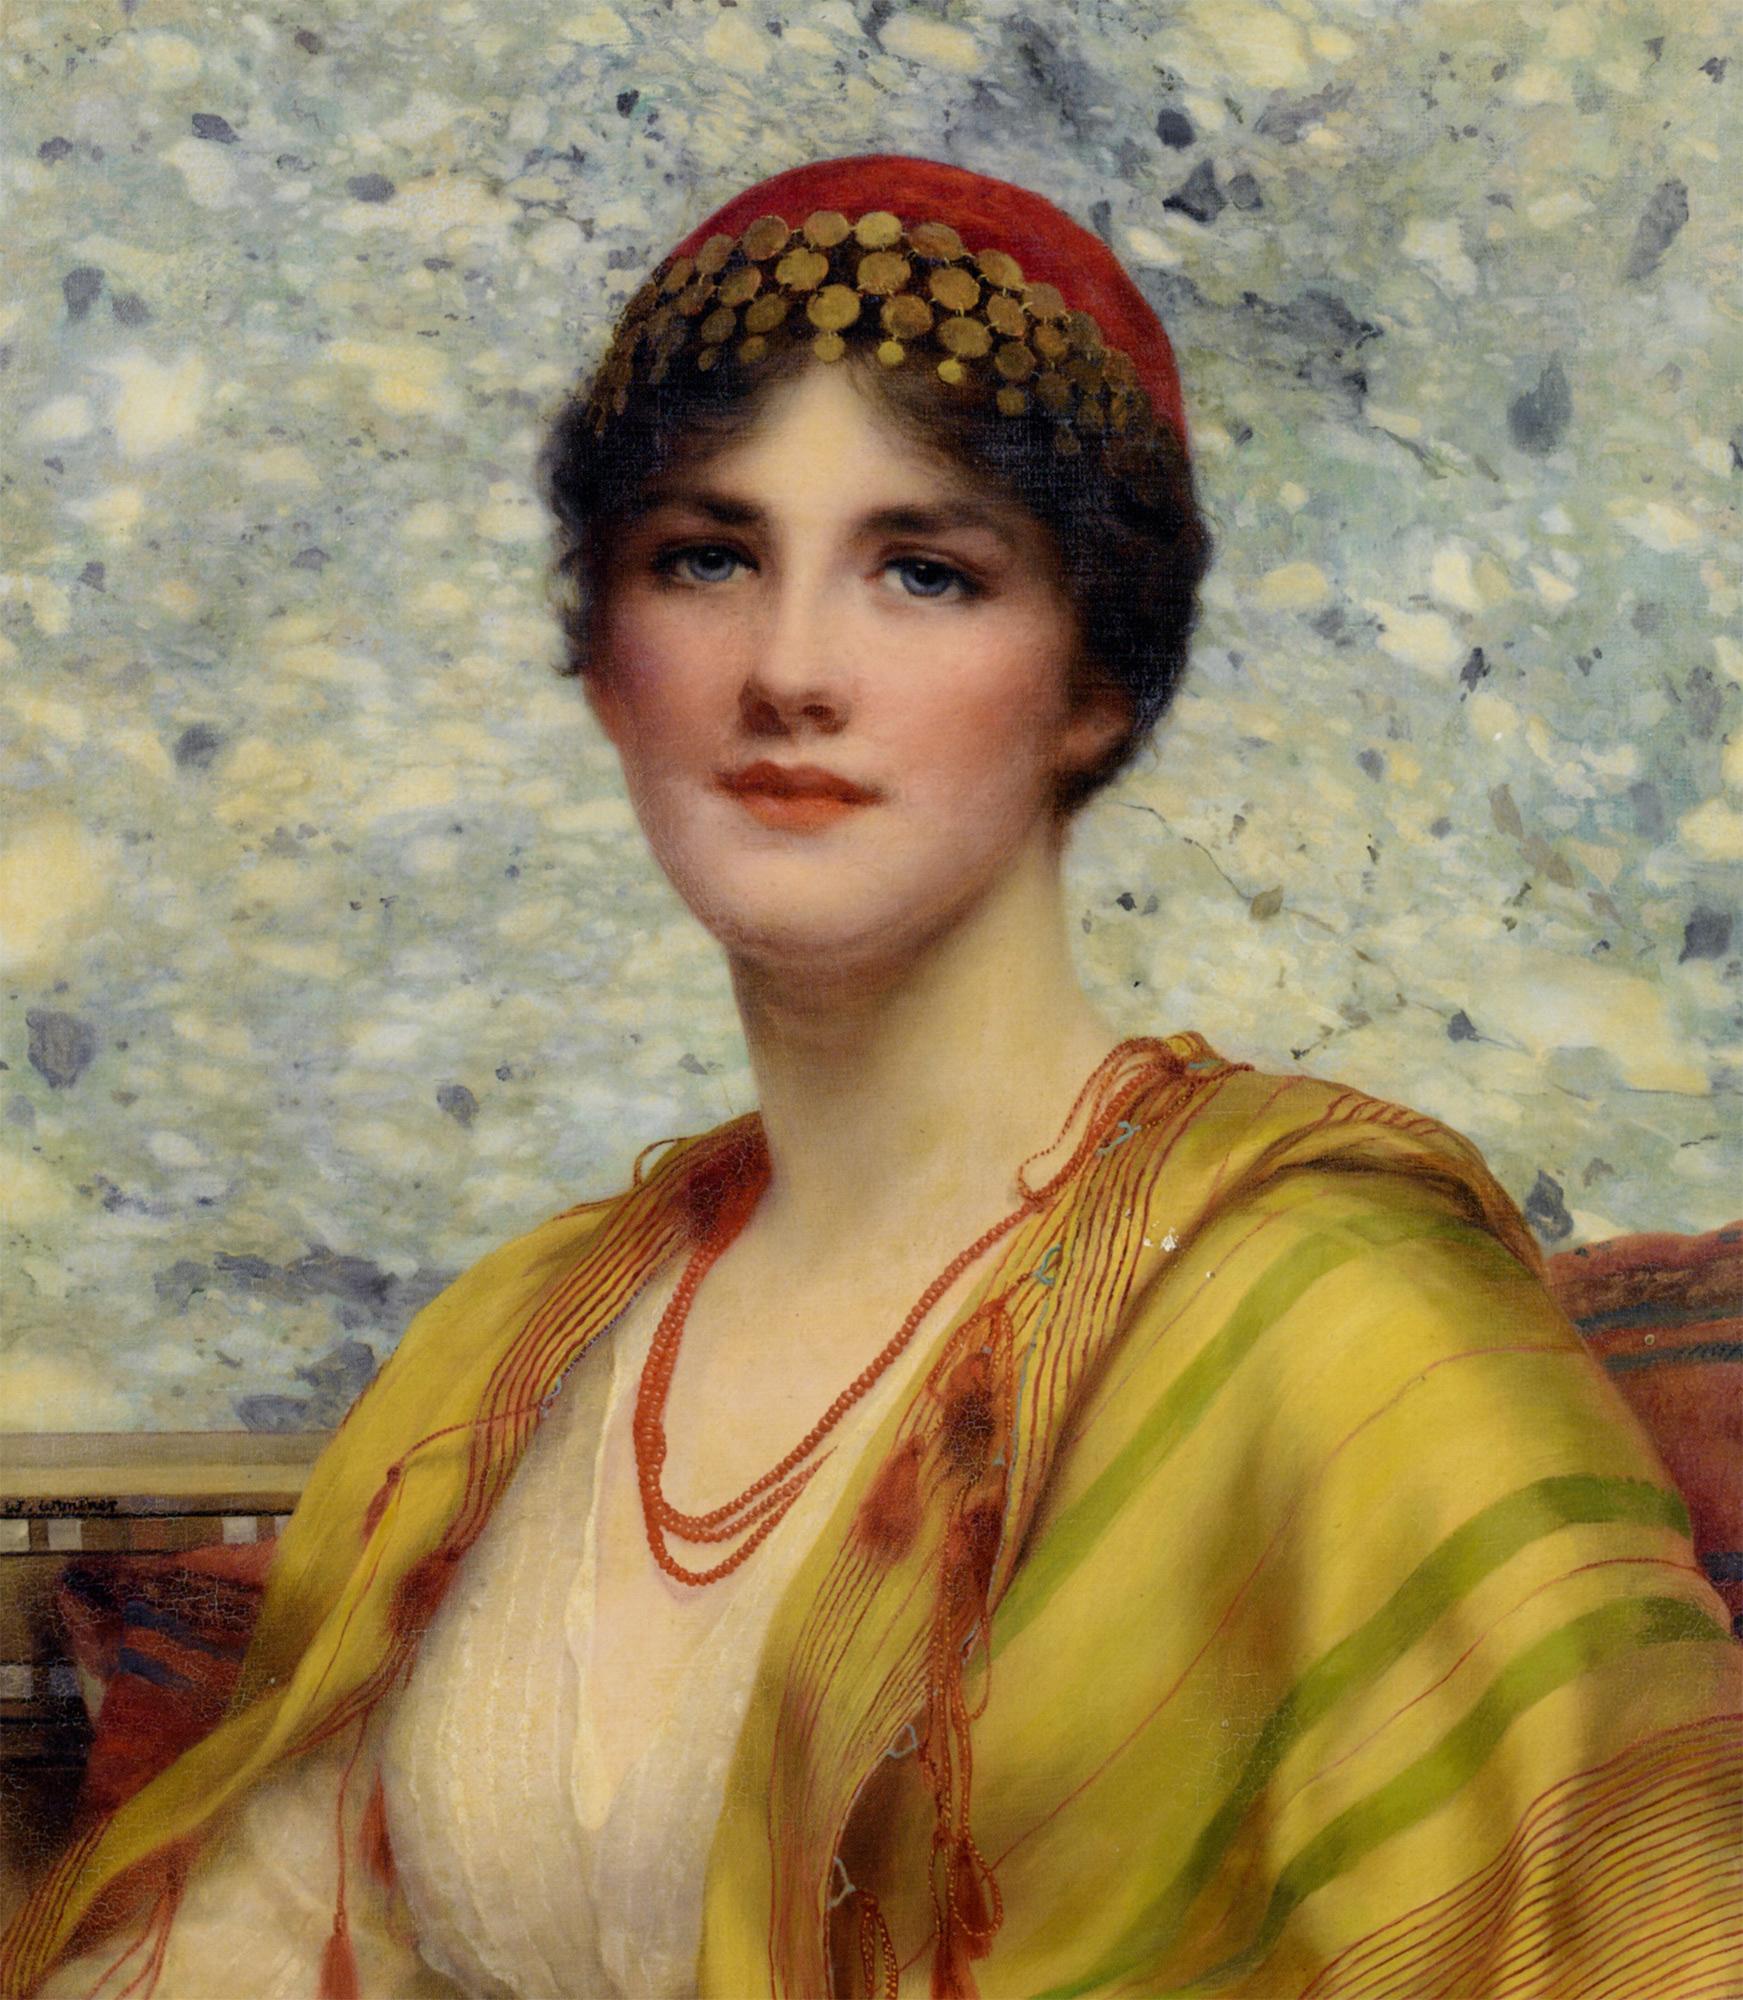 импрессионисты и эротика картины